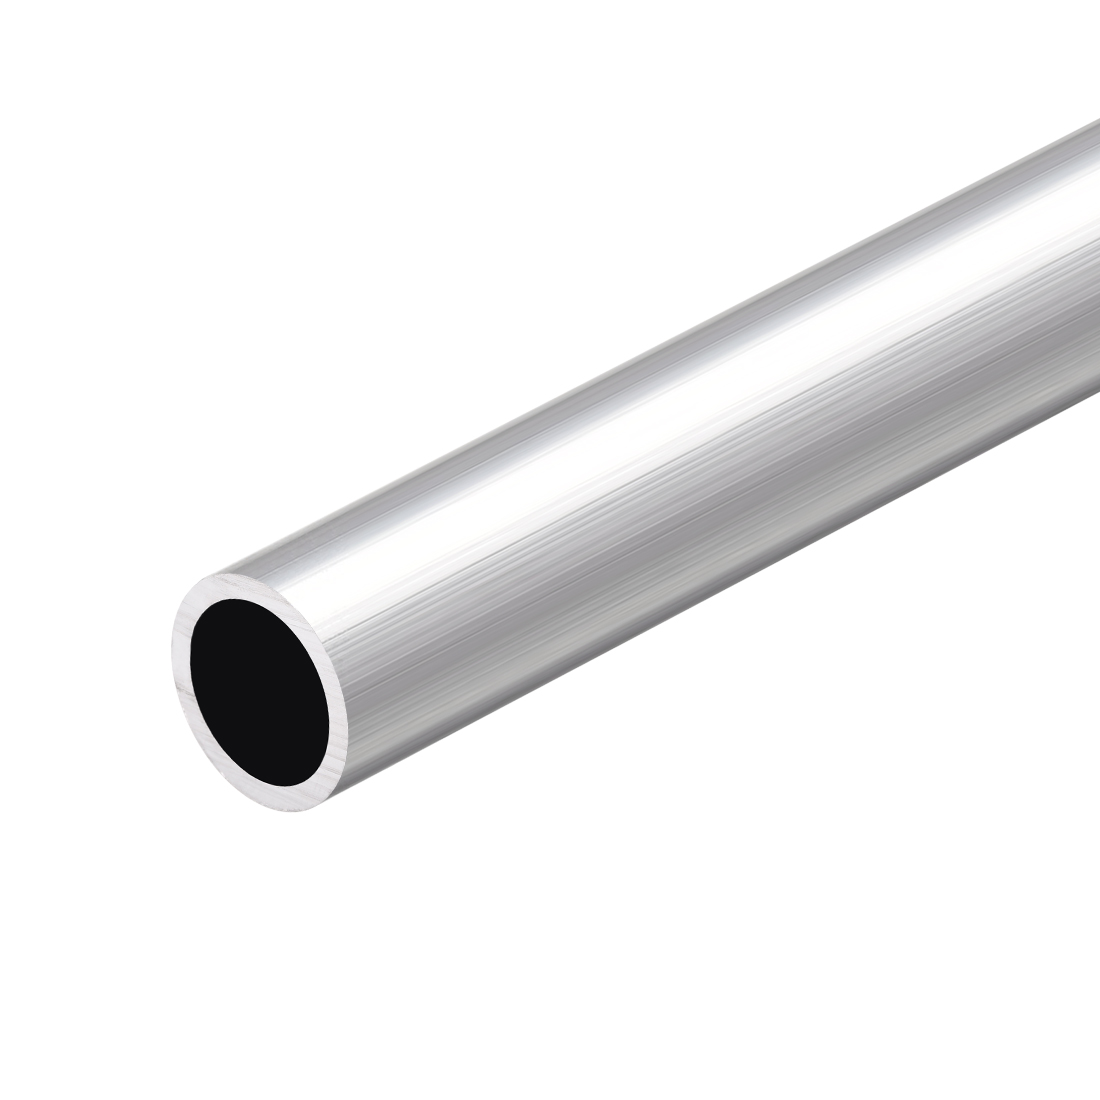 6063 Aluminum Round Tube 300mm Length x 15mm Inner Dia x 19mm OD Seamless Tubing